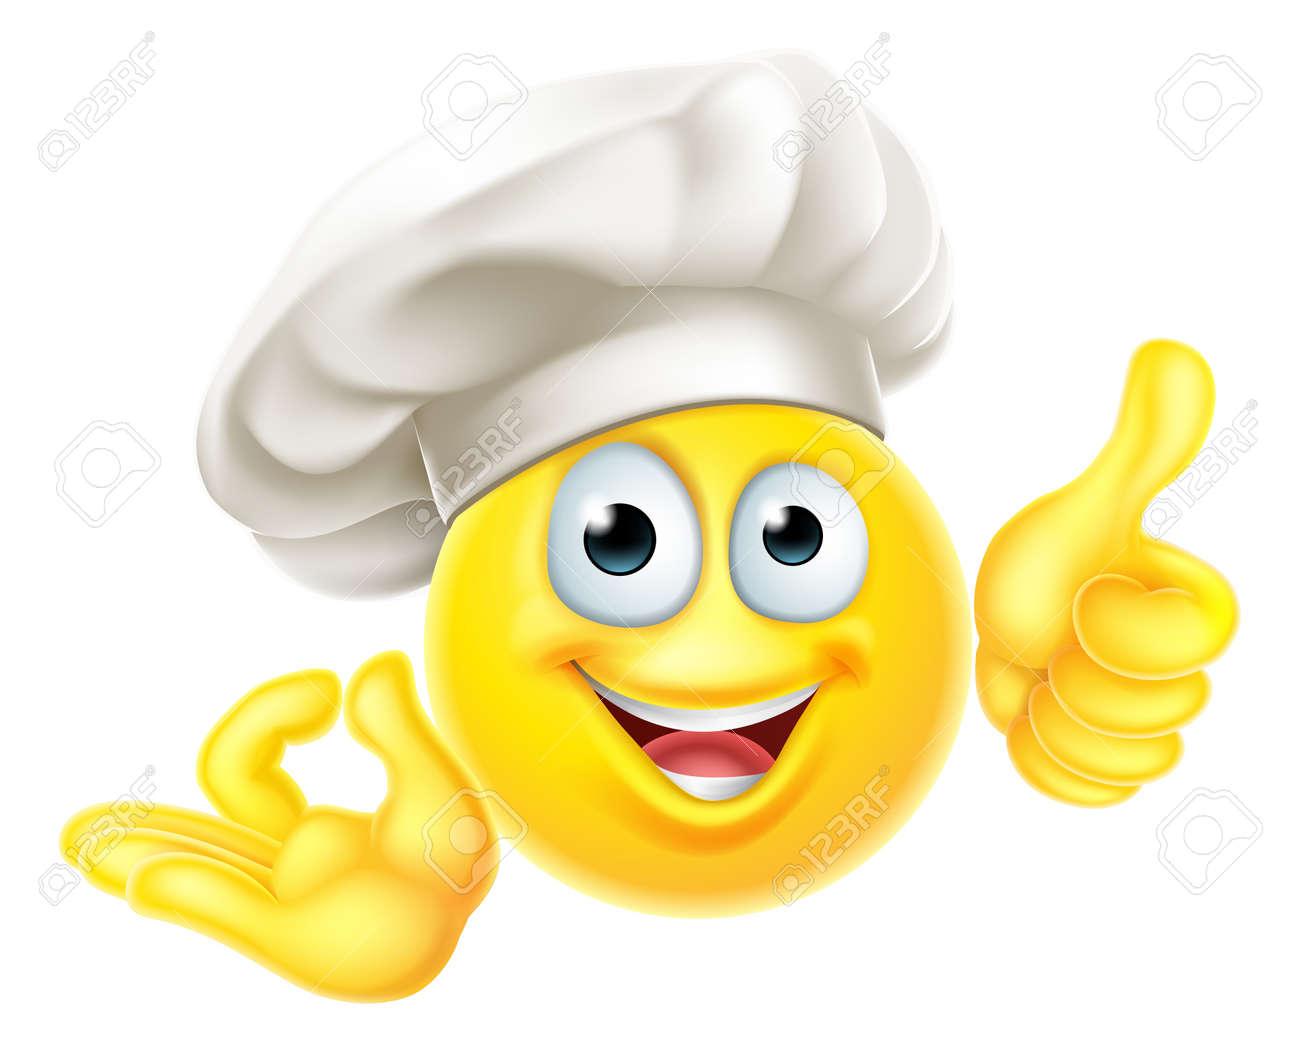 Emoji Chef Cook Cartoon OK Thumbs Up - 131701049